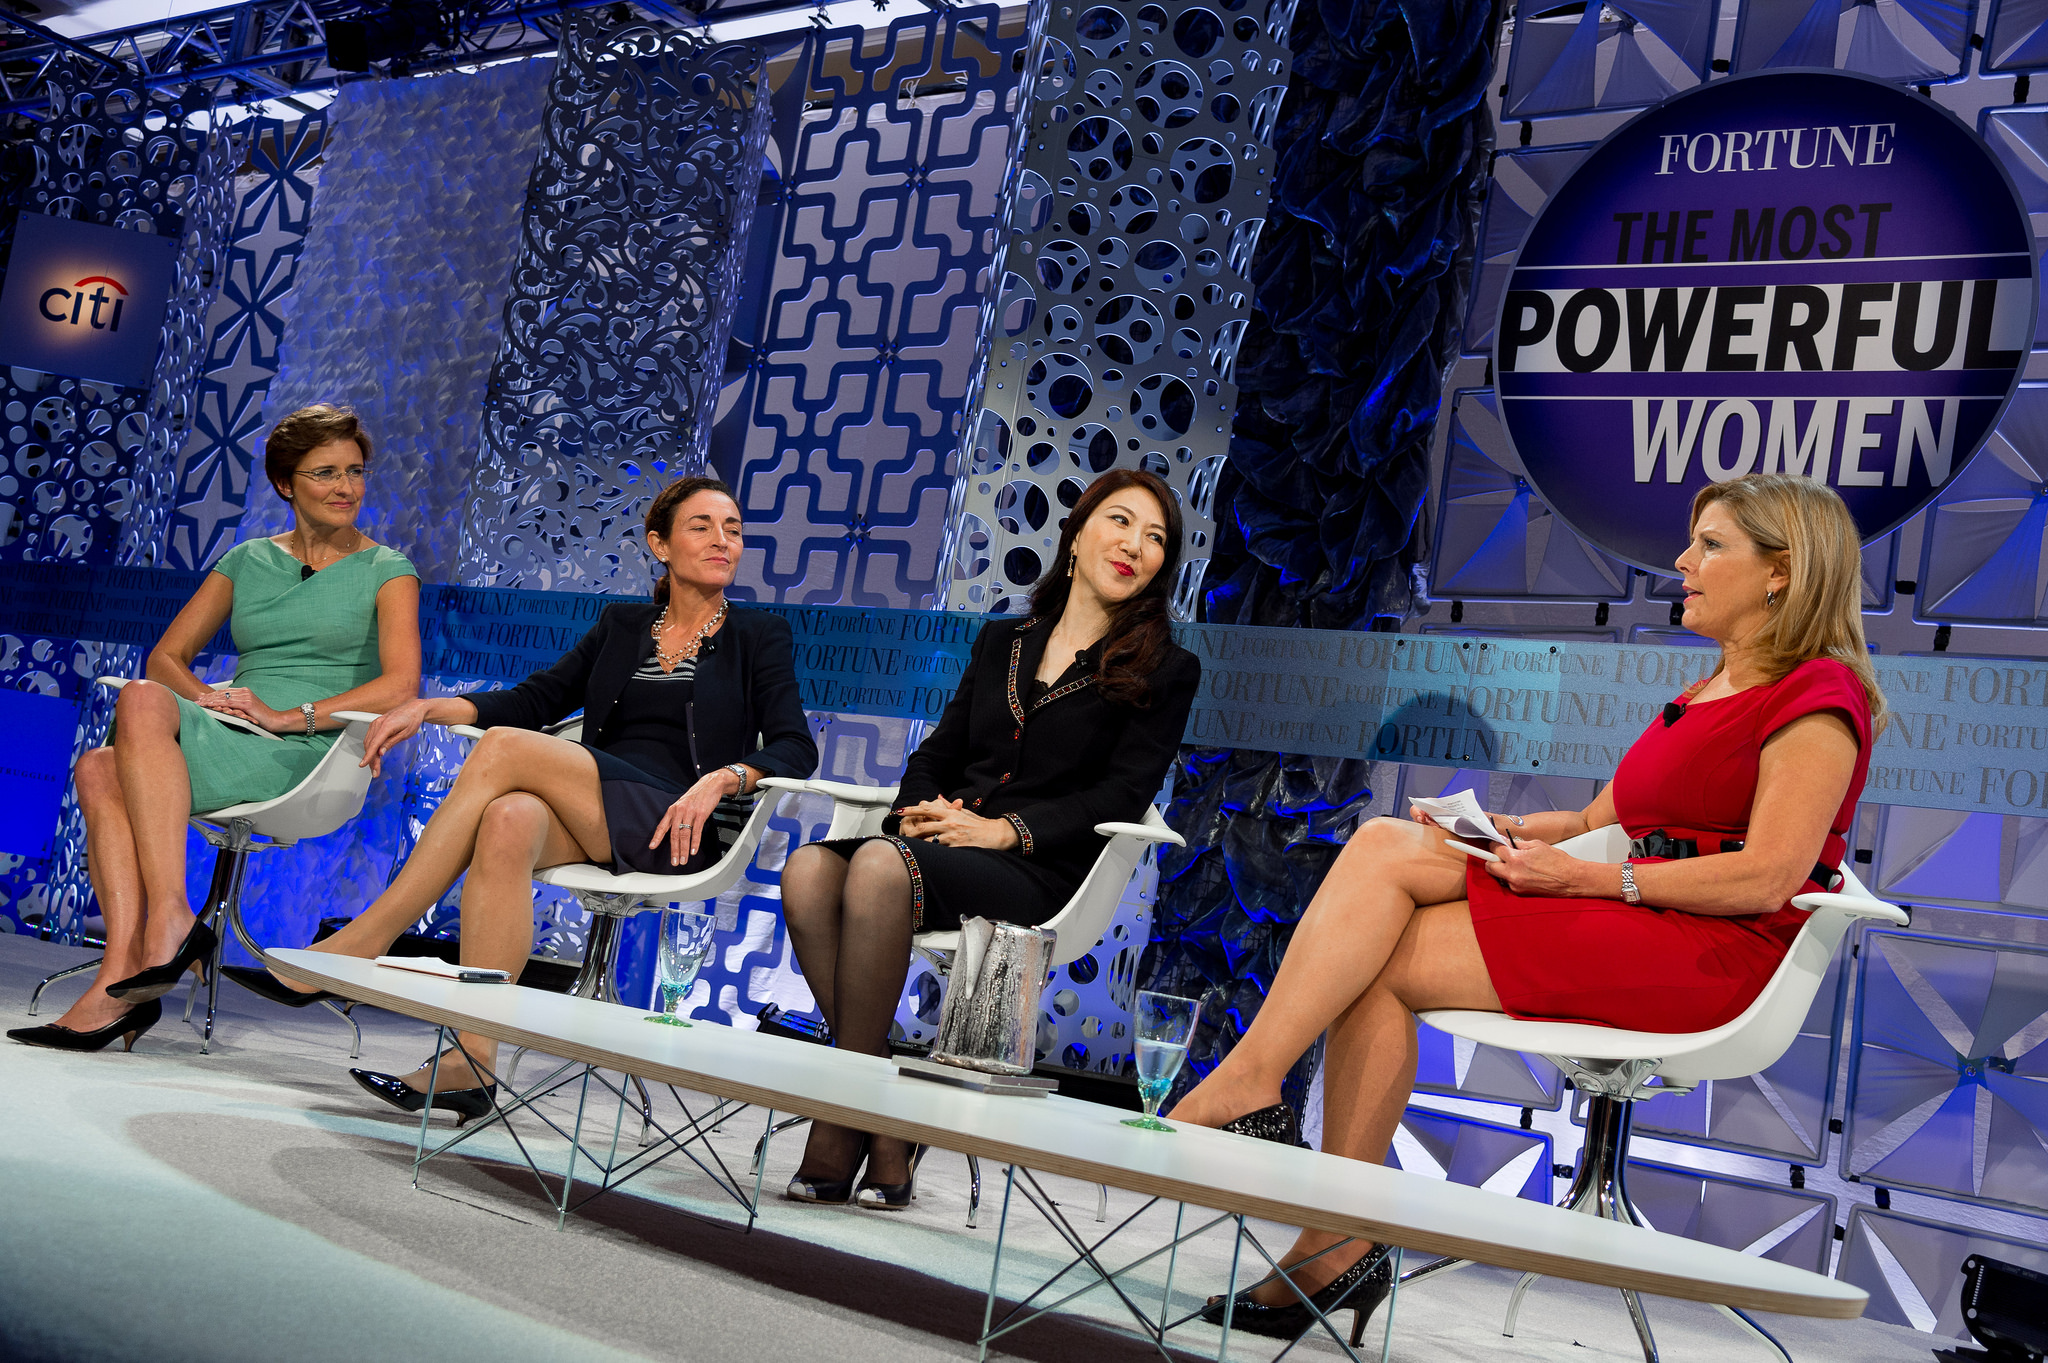 Jane Fraser, Diana Farrell,  Wei Sun Christianson,  Moderator: Nina Easton